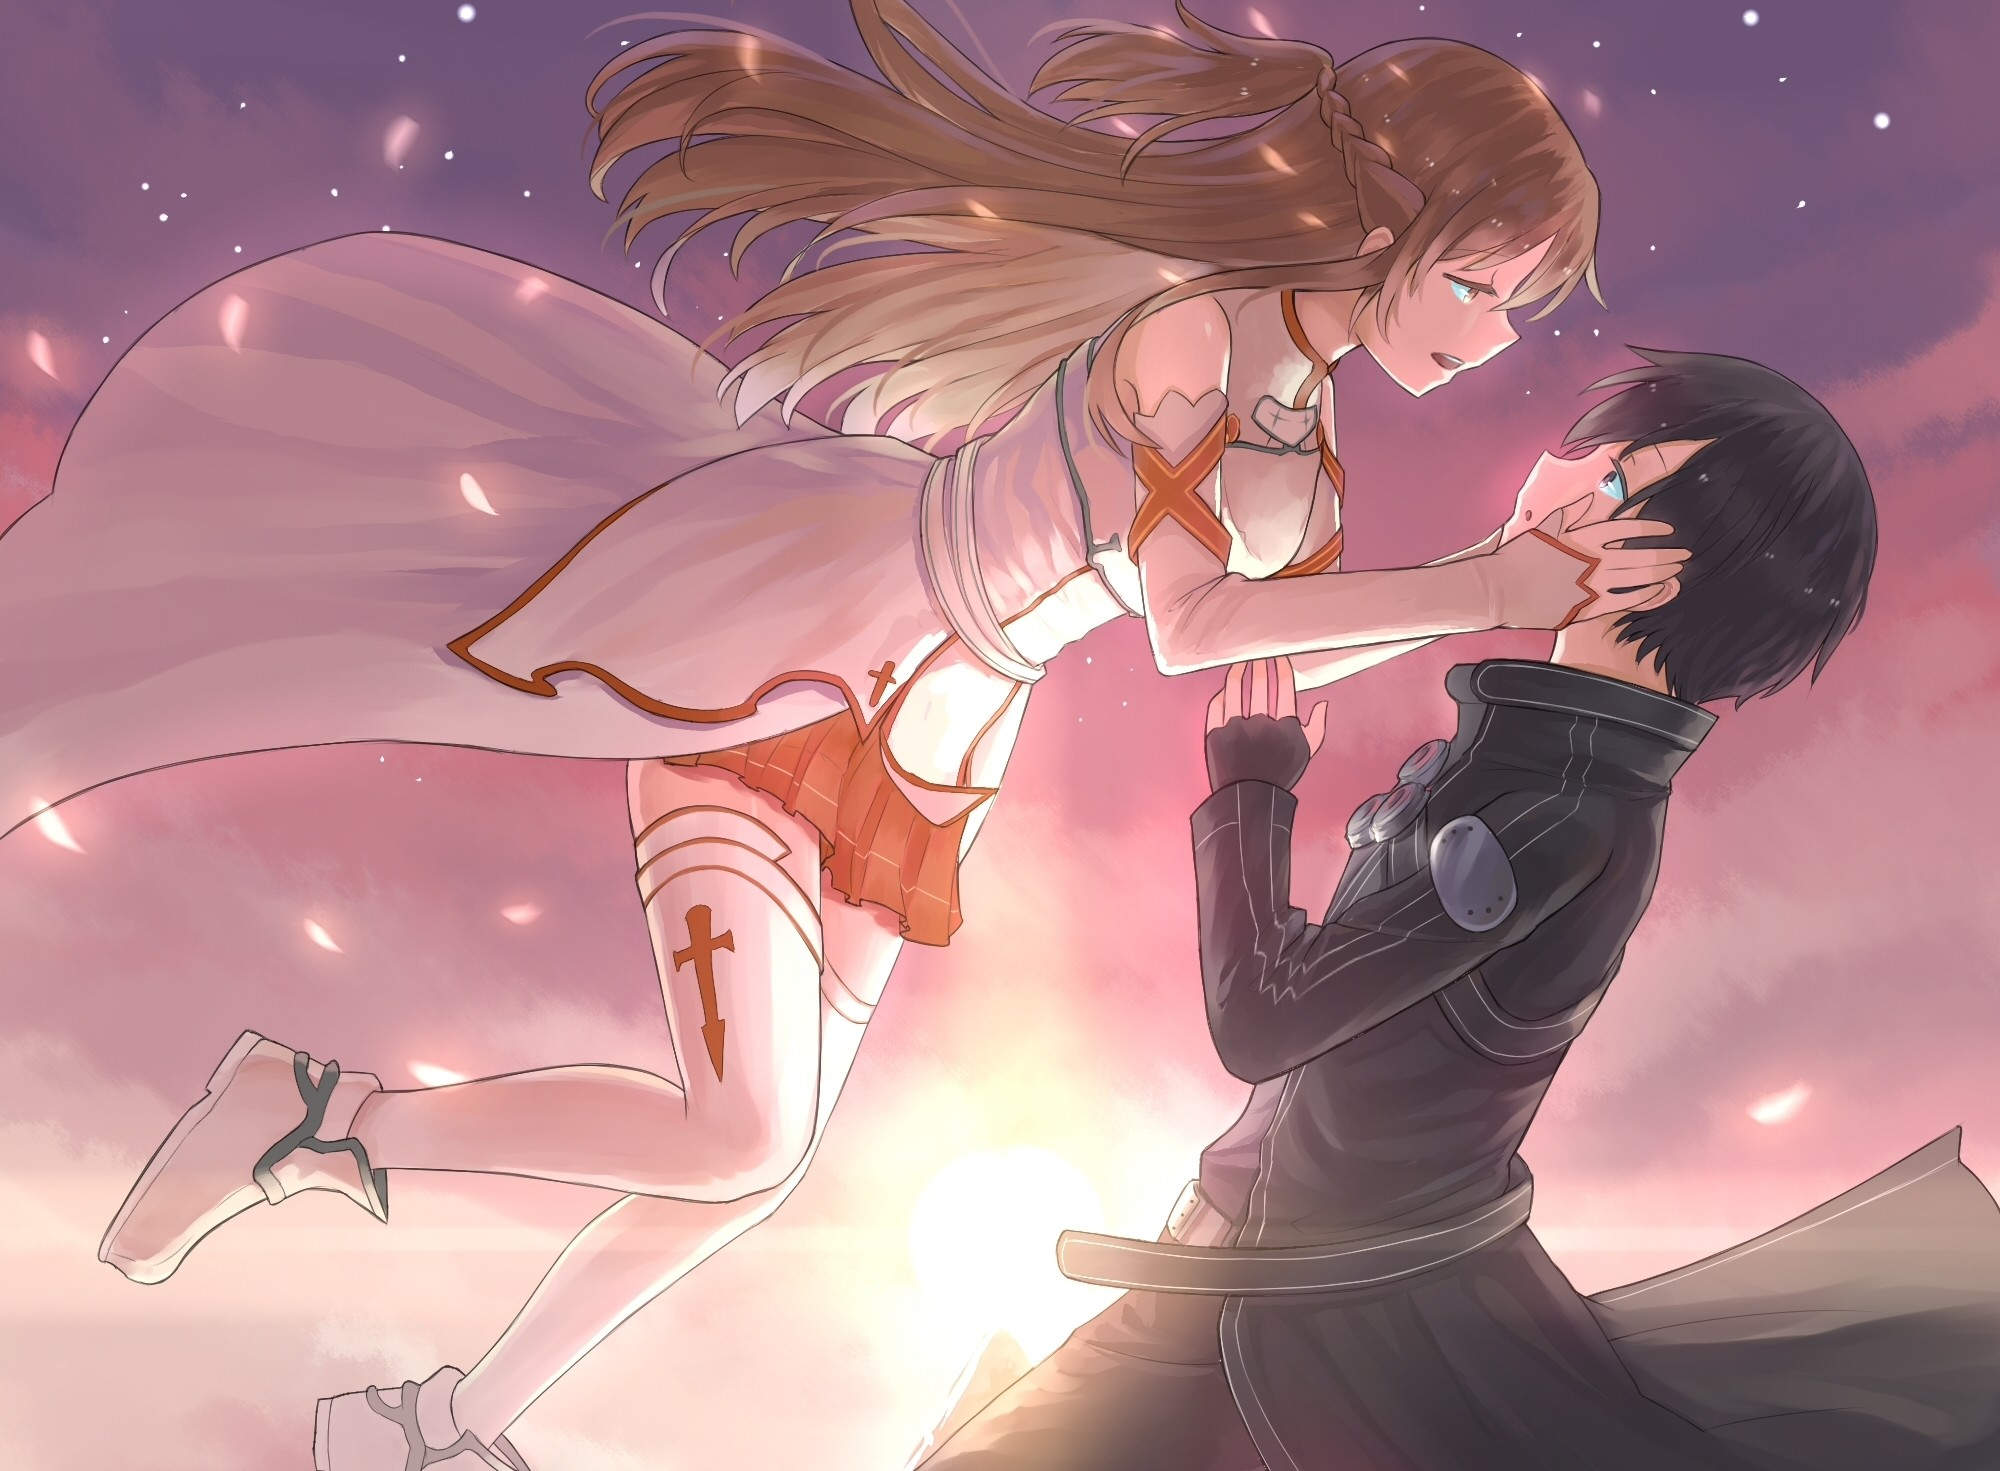 Sword Art Online Kirito and Asuna Hug